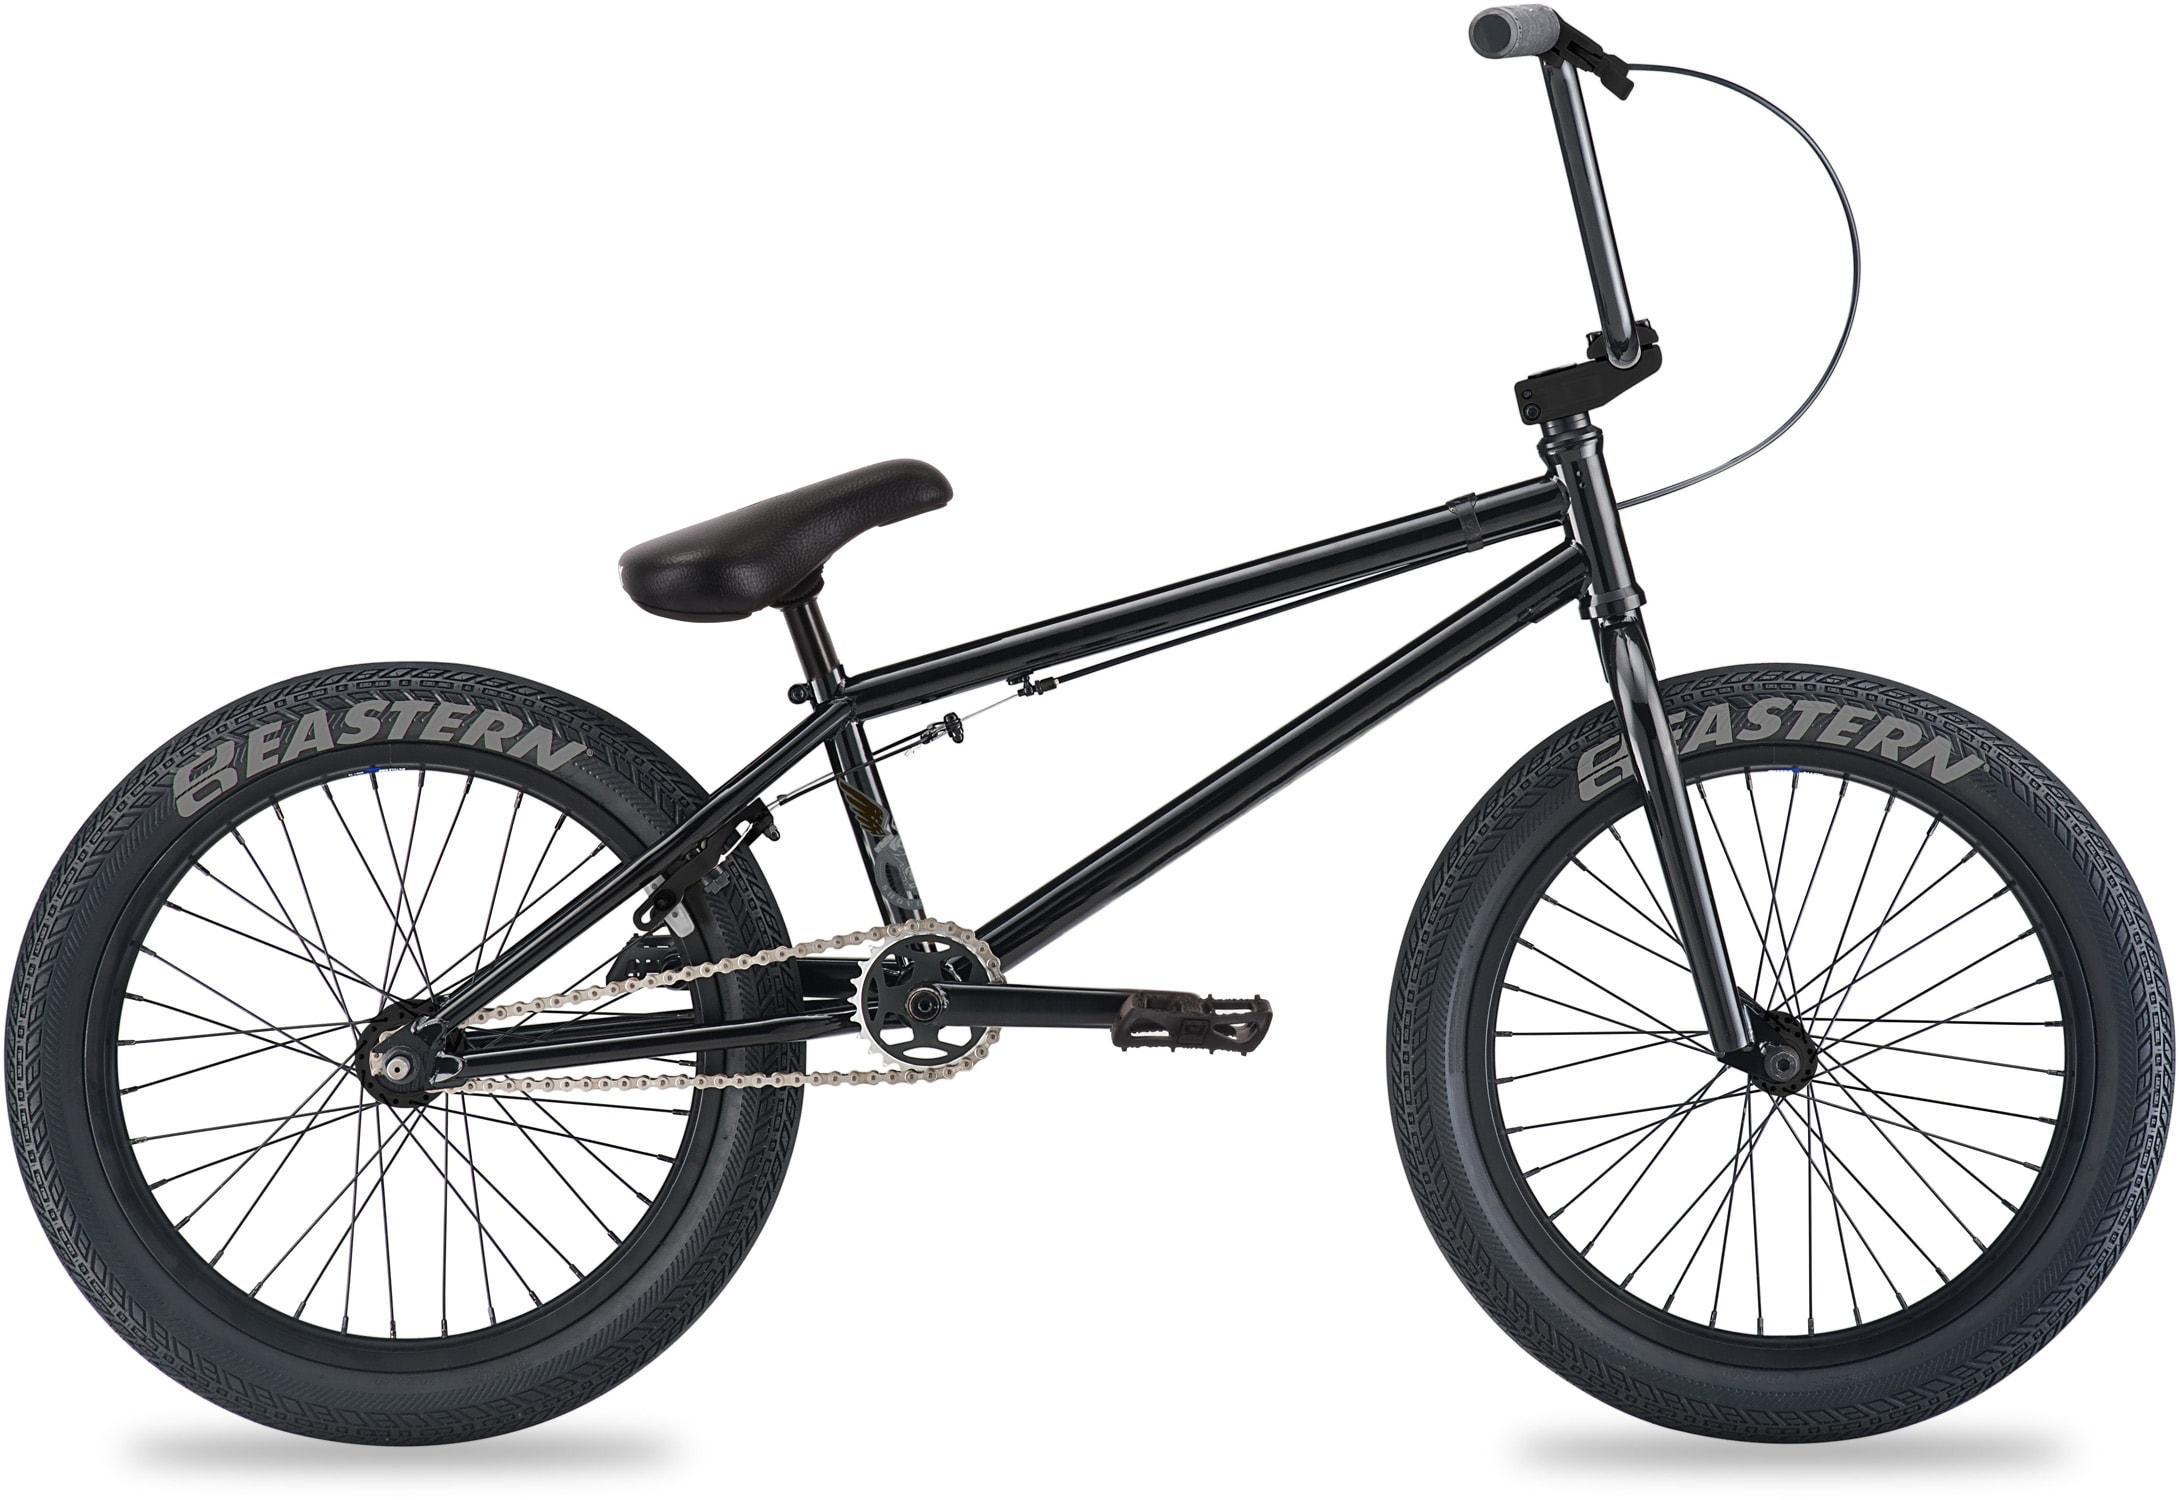 Image of Eastern Shovelhead BMX Bike